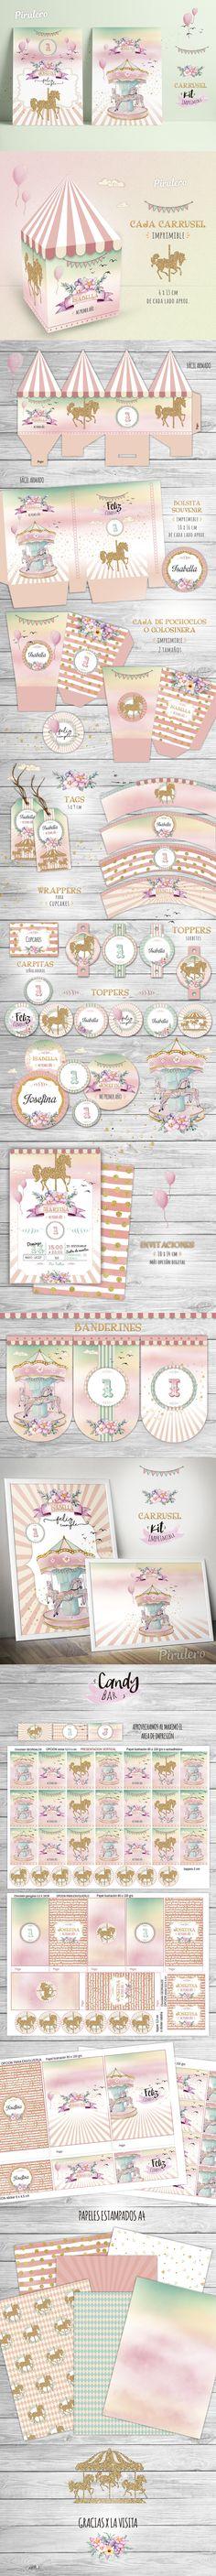 Kit imprimible Carrusel Printable kit Carousel party decorations #Printable #CarruselParty #carouselParty #carrusel #carousel #party #birthday